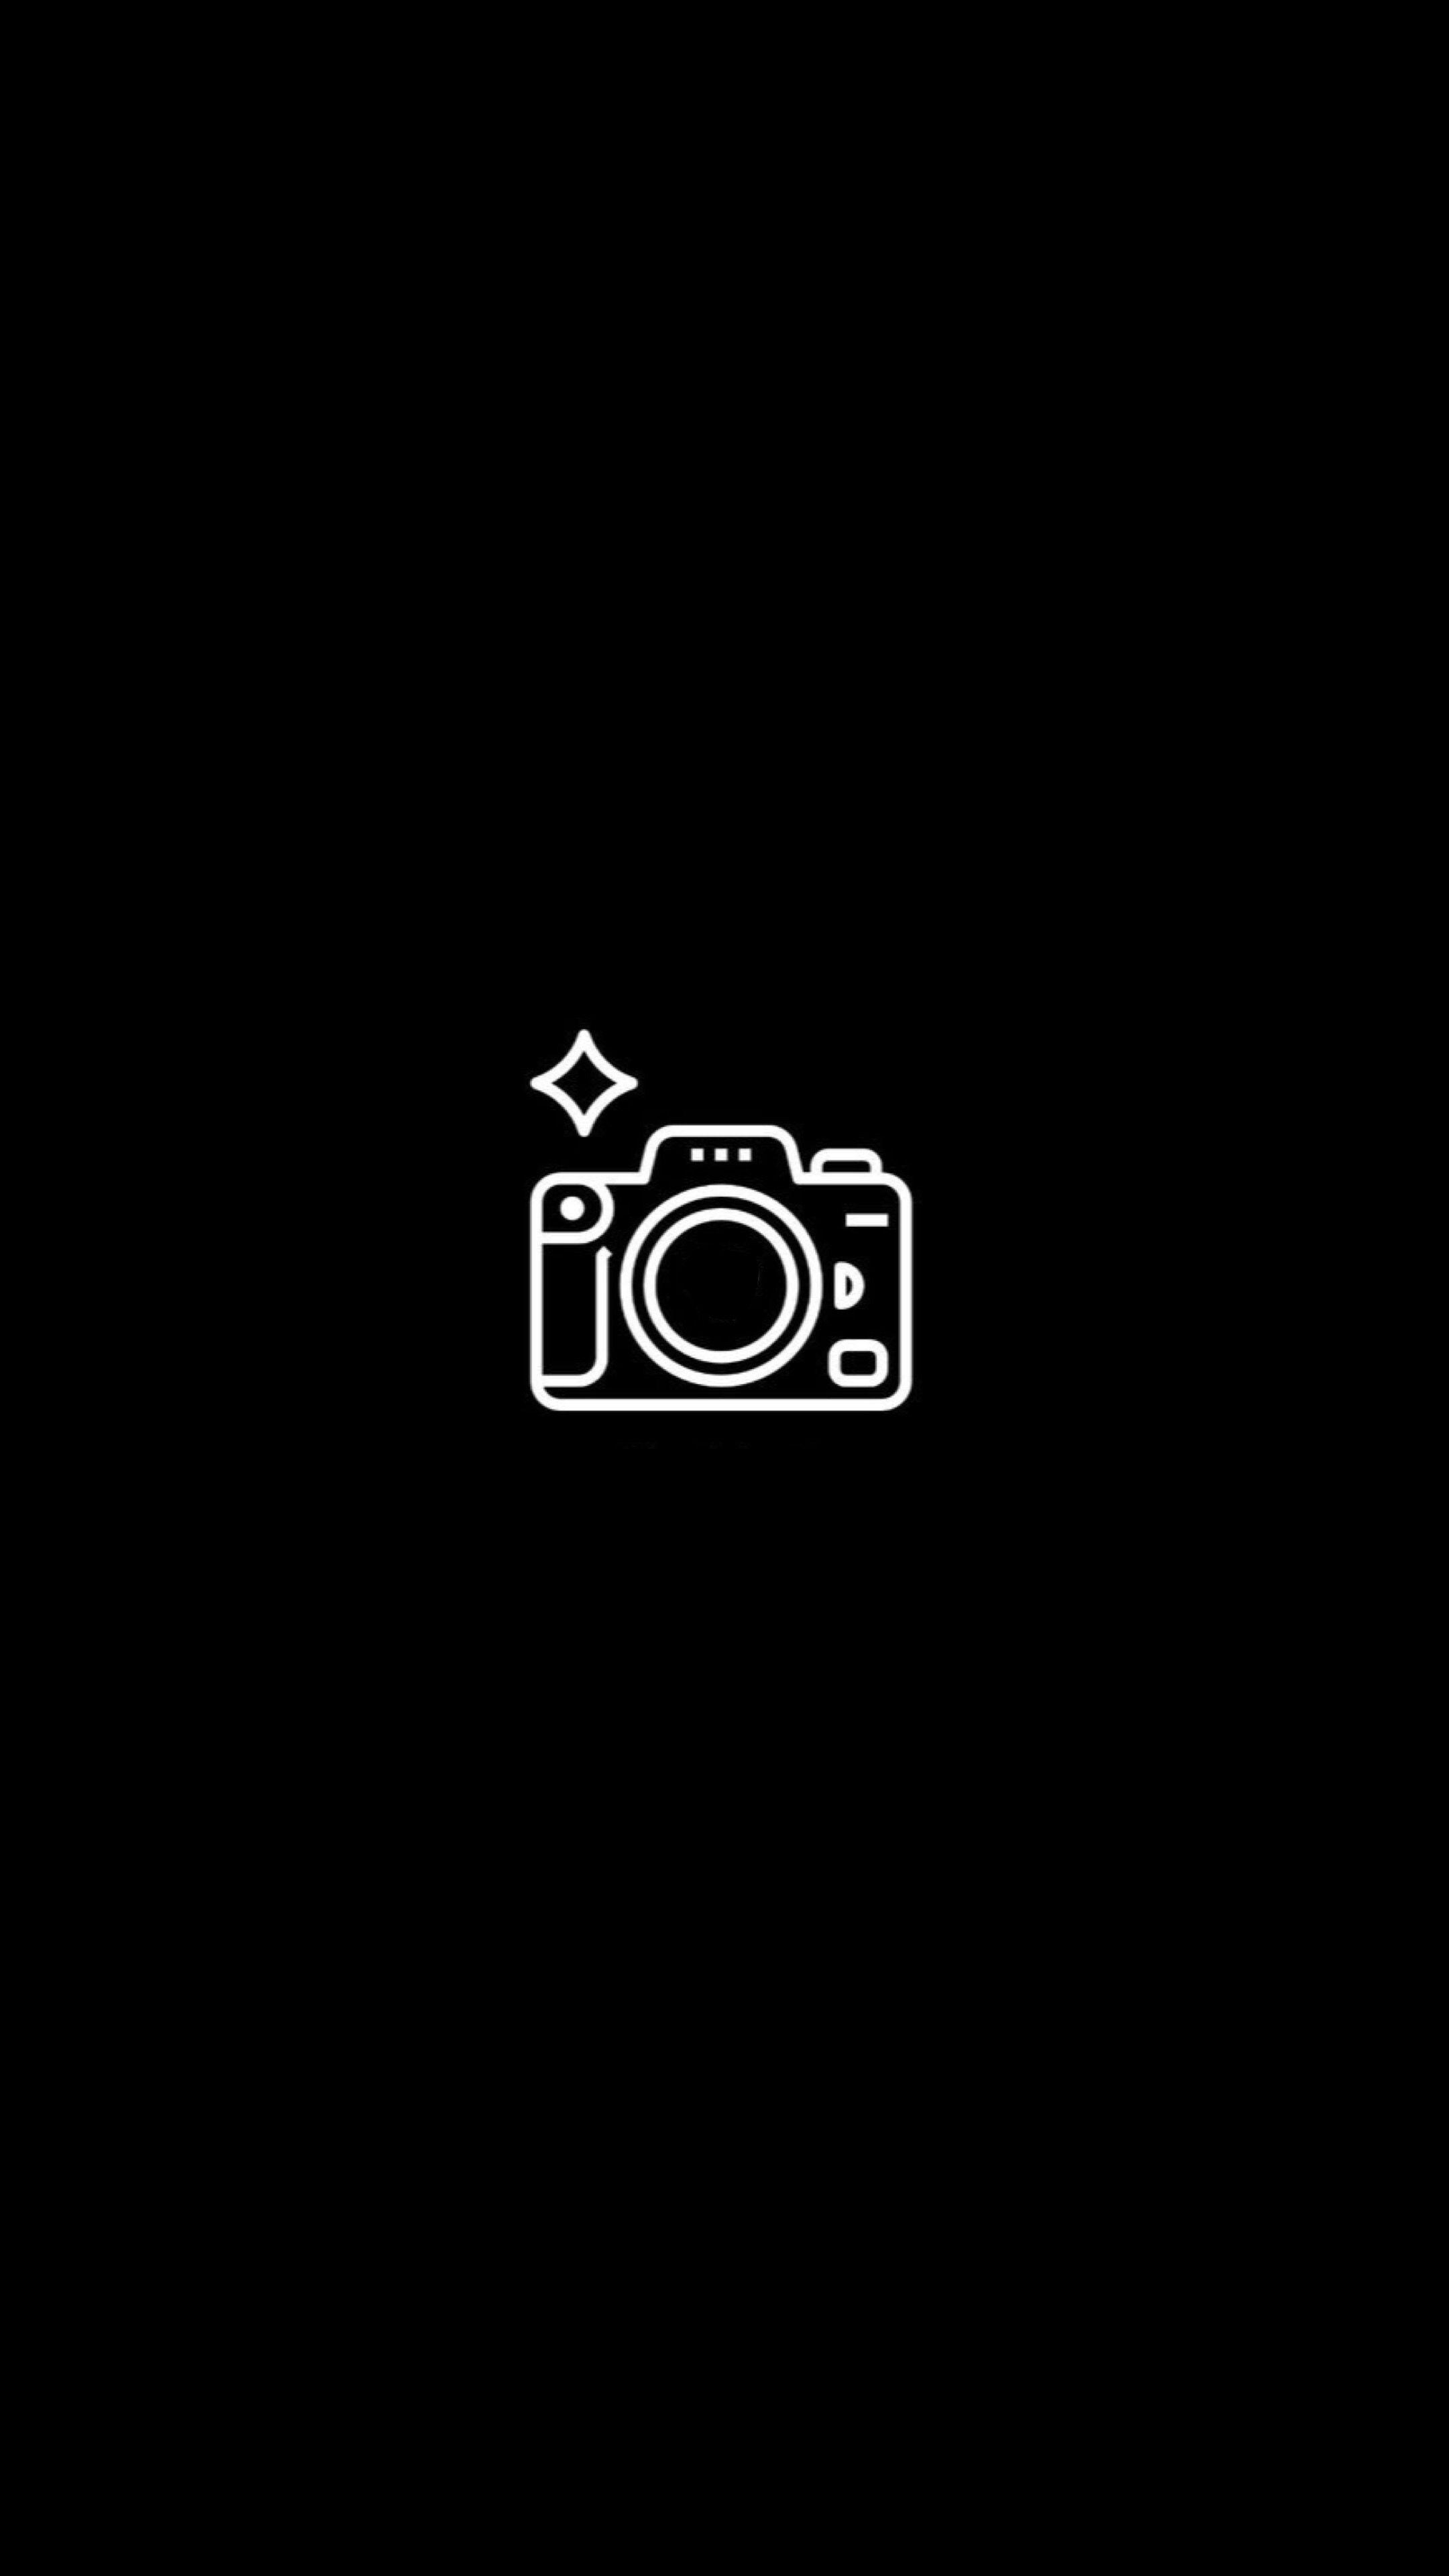 Instagram Highlight Icons Black Instagram Black Theme Black And White Instagram Instagram Highlight Icons